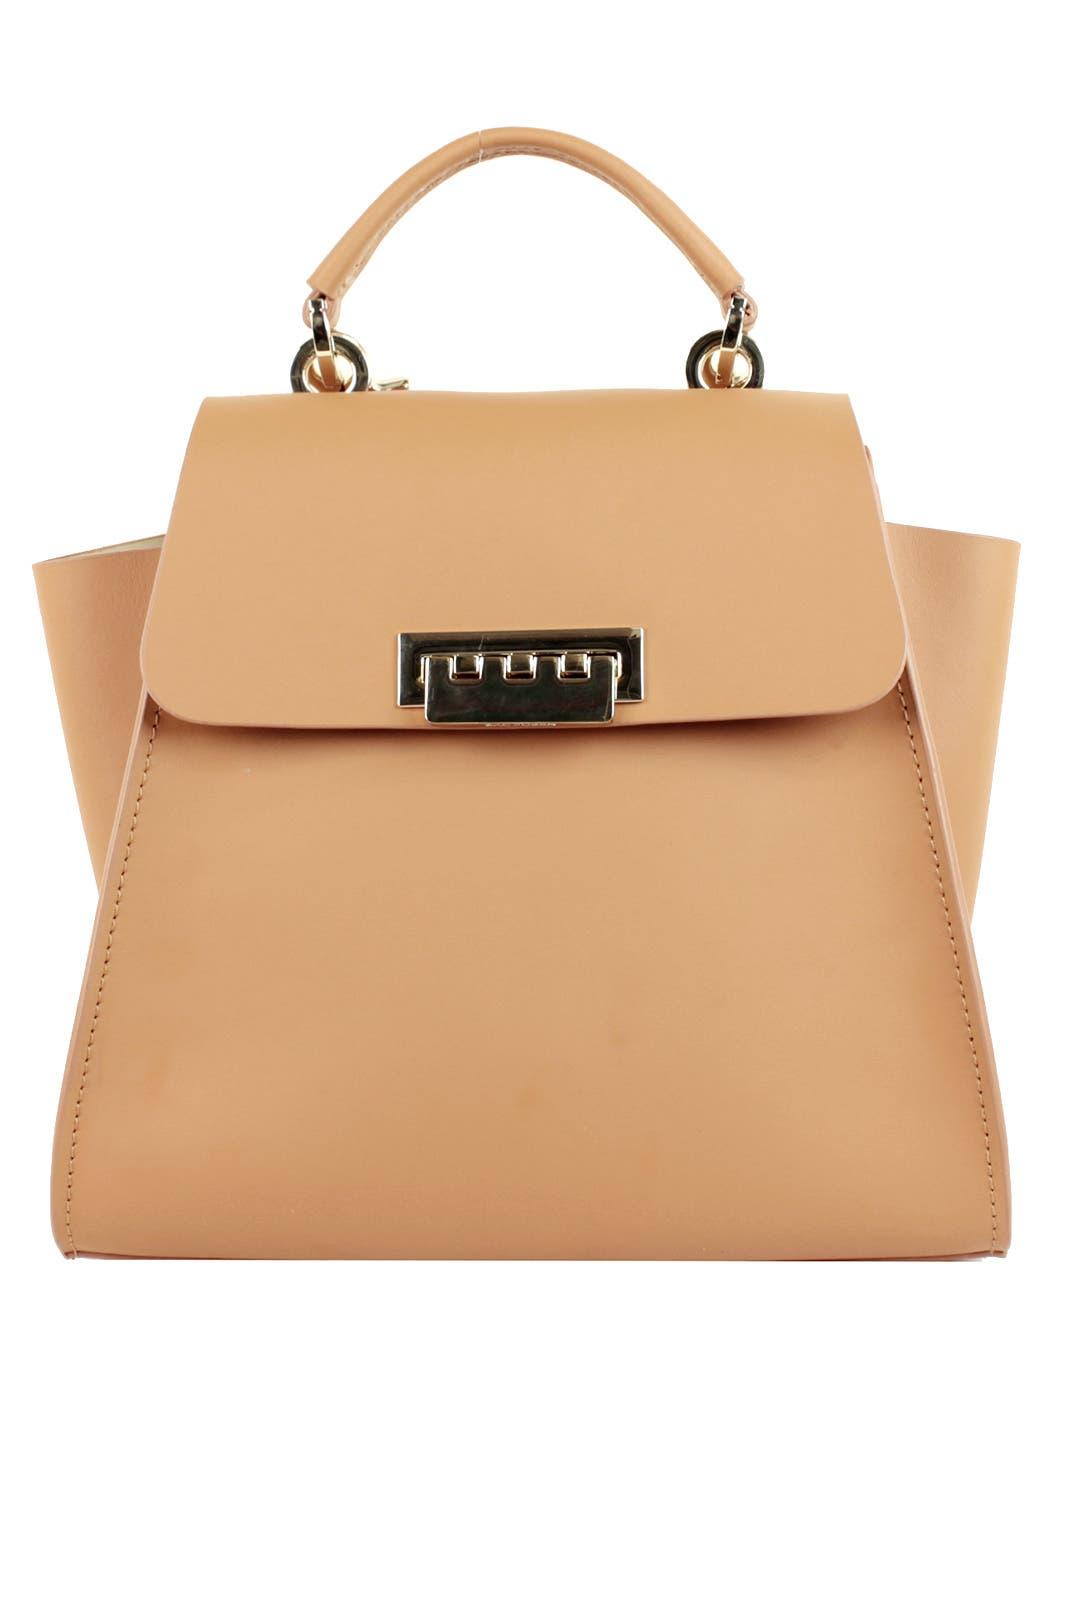 Apricot Eartha Iconic Convertible Handbag By Zac Zac Posen